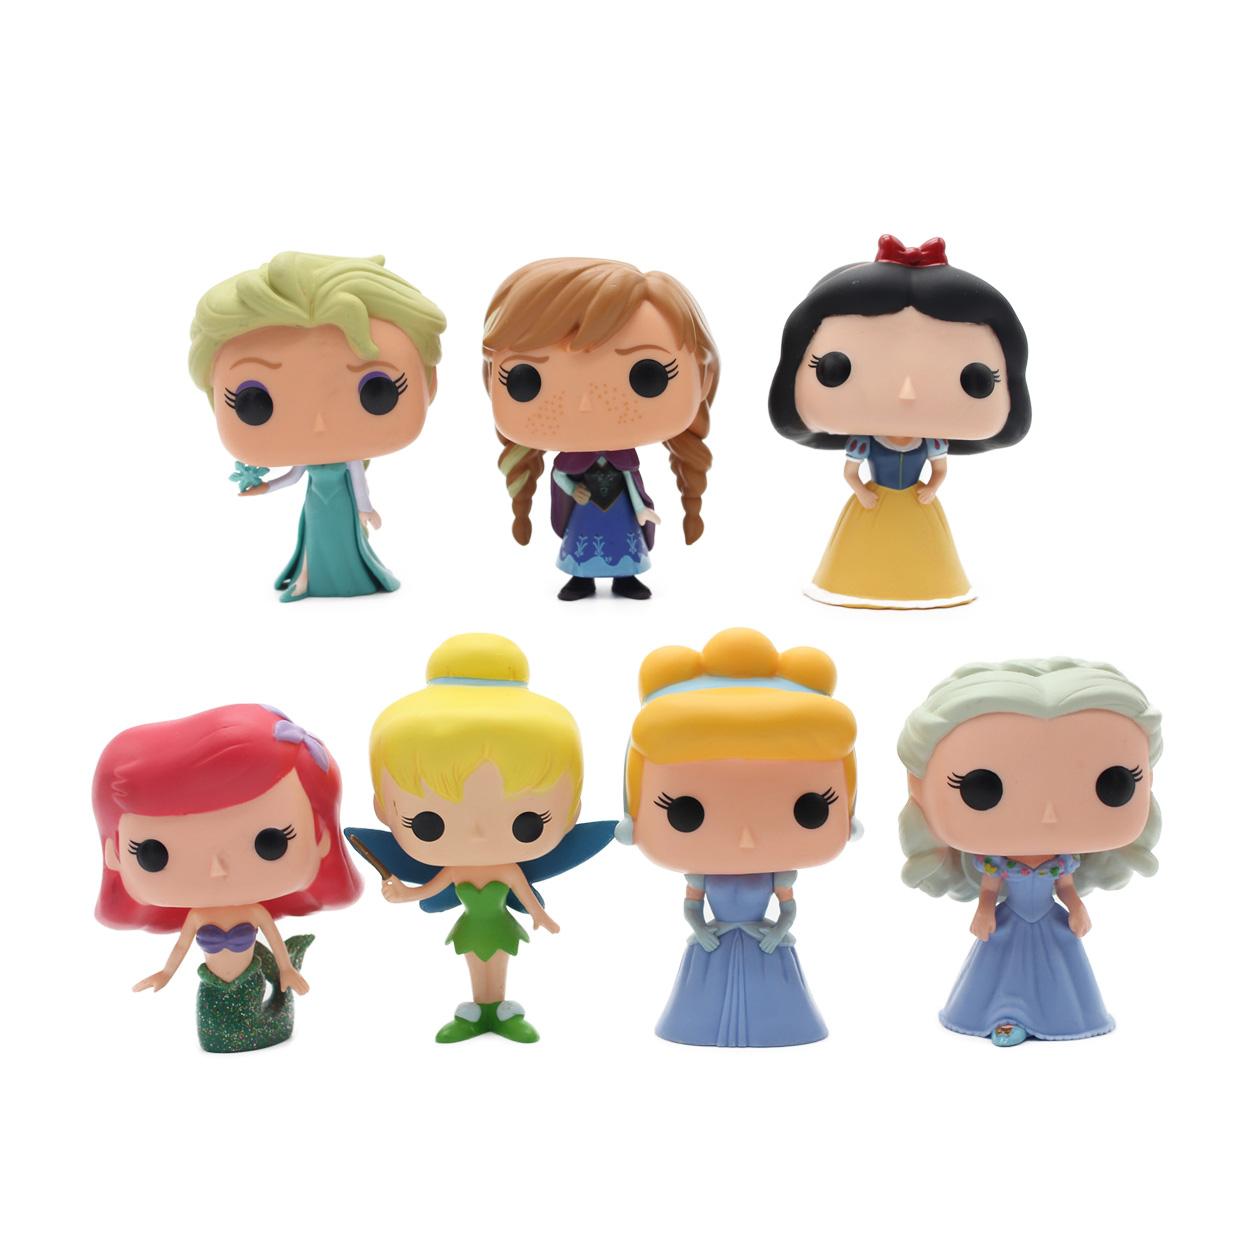 OPP 1pcs Funko Pop Princess Cinderella Tinker Bell Ariel Snow White Elsa Anna PVC Anime Movie Vinyl Cute Moedel Figure Toys(China (Mainland))